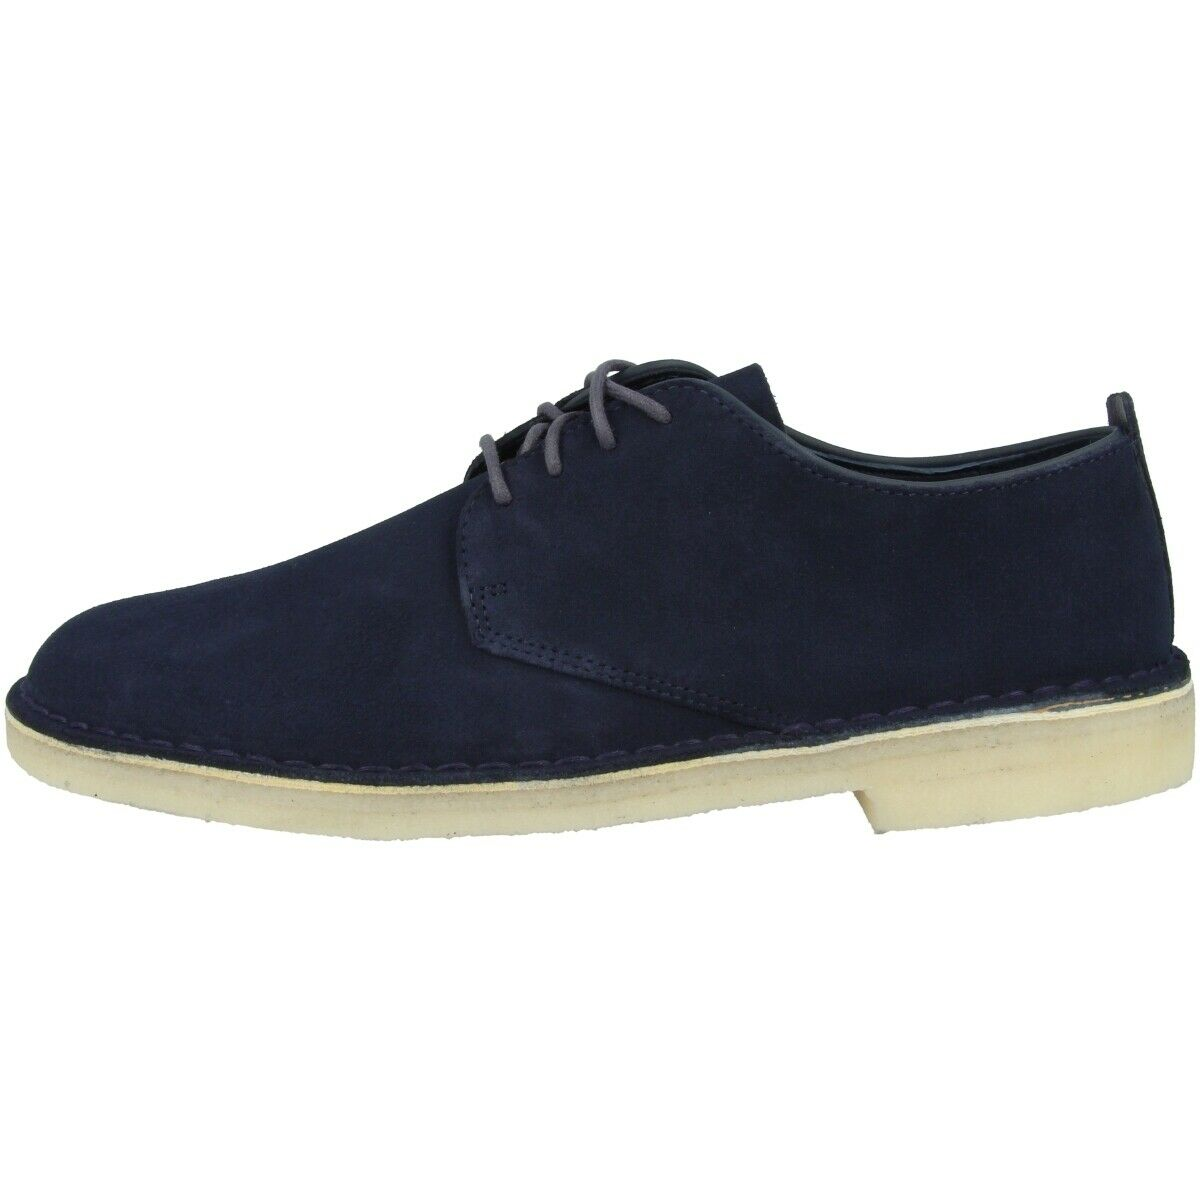 Clarks Desert londres zapatos Men zapato bajo ejecutivo con cordones Midnight 26122624